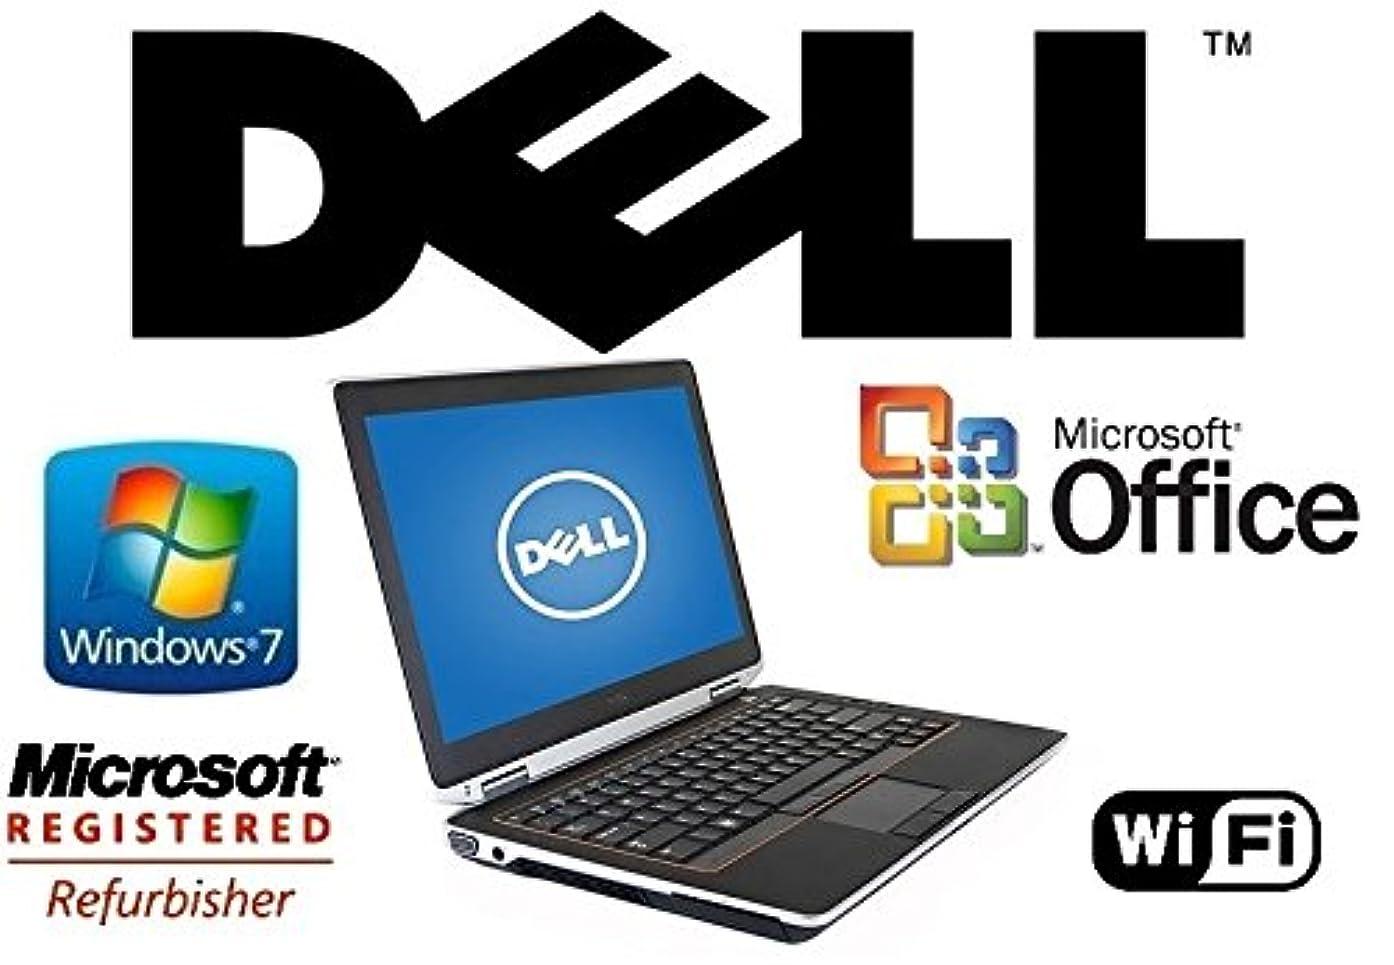 Sleek Latitude E6420 Notebook PC - Fast Intel Core i7 2.7GHz CPU / 16GB DDR3 RAM / New Huge 2TB HDD - WiFi - DVD-RW - Windows 7 Pro 64-Bit OS +MS Office Laptop